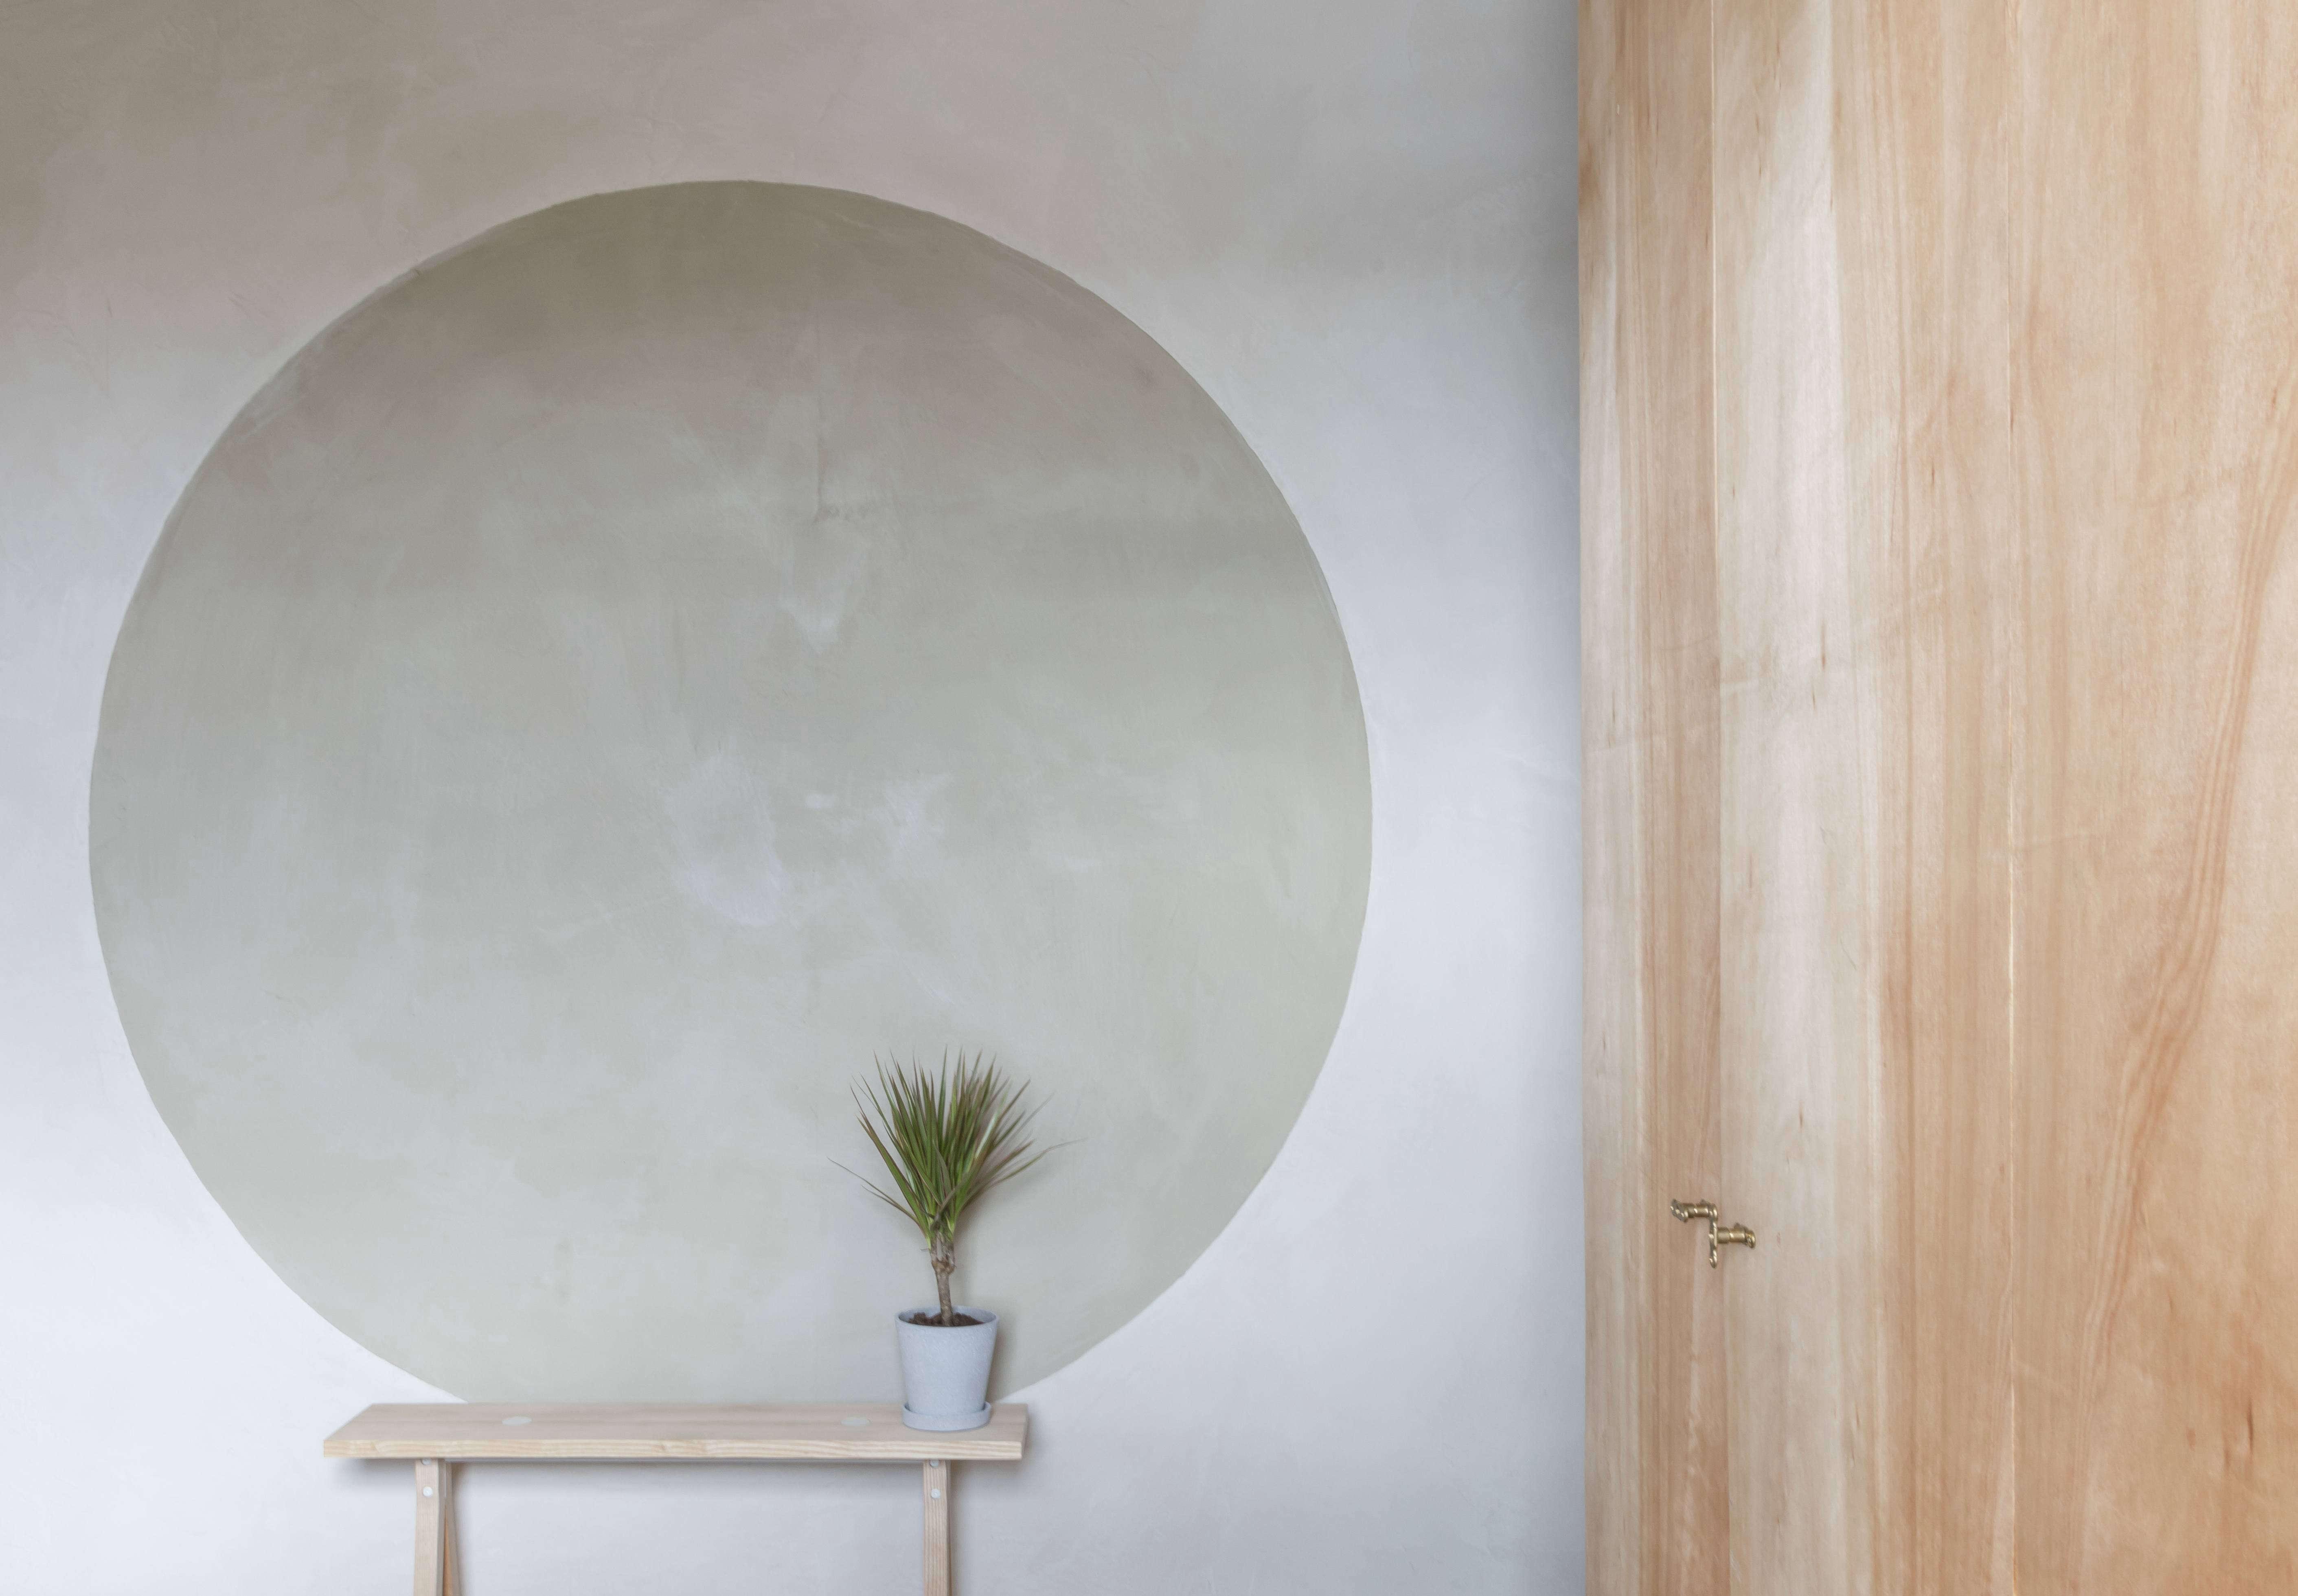 Remodeling 101: Modern Plaster Walls, Six Ways